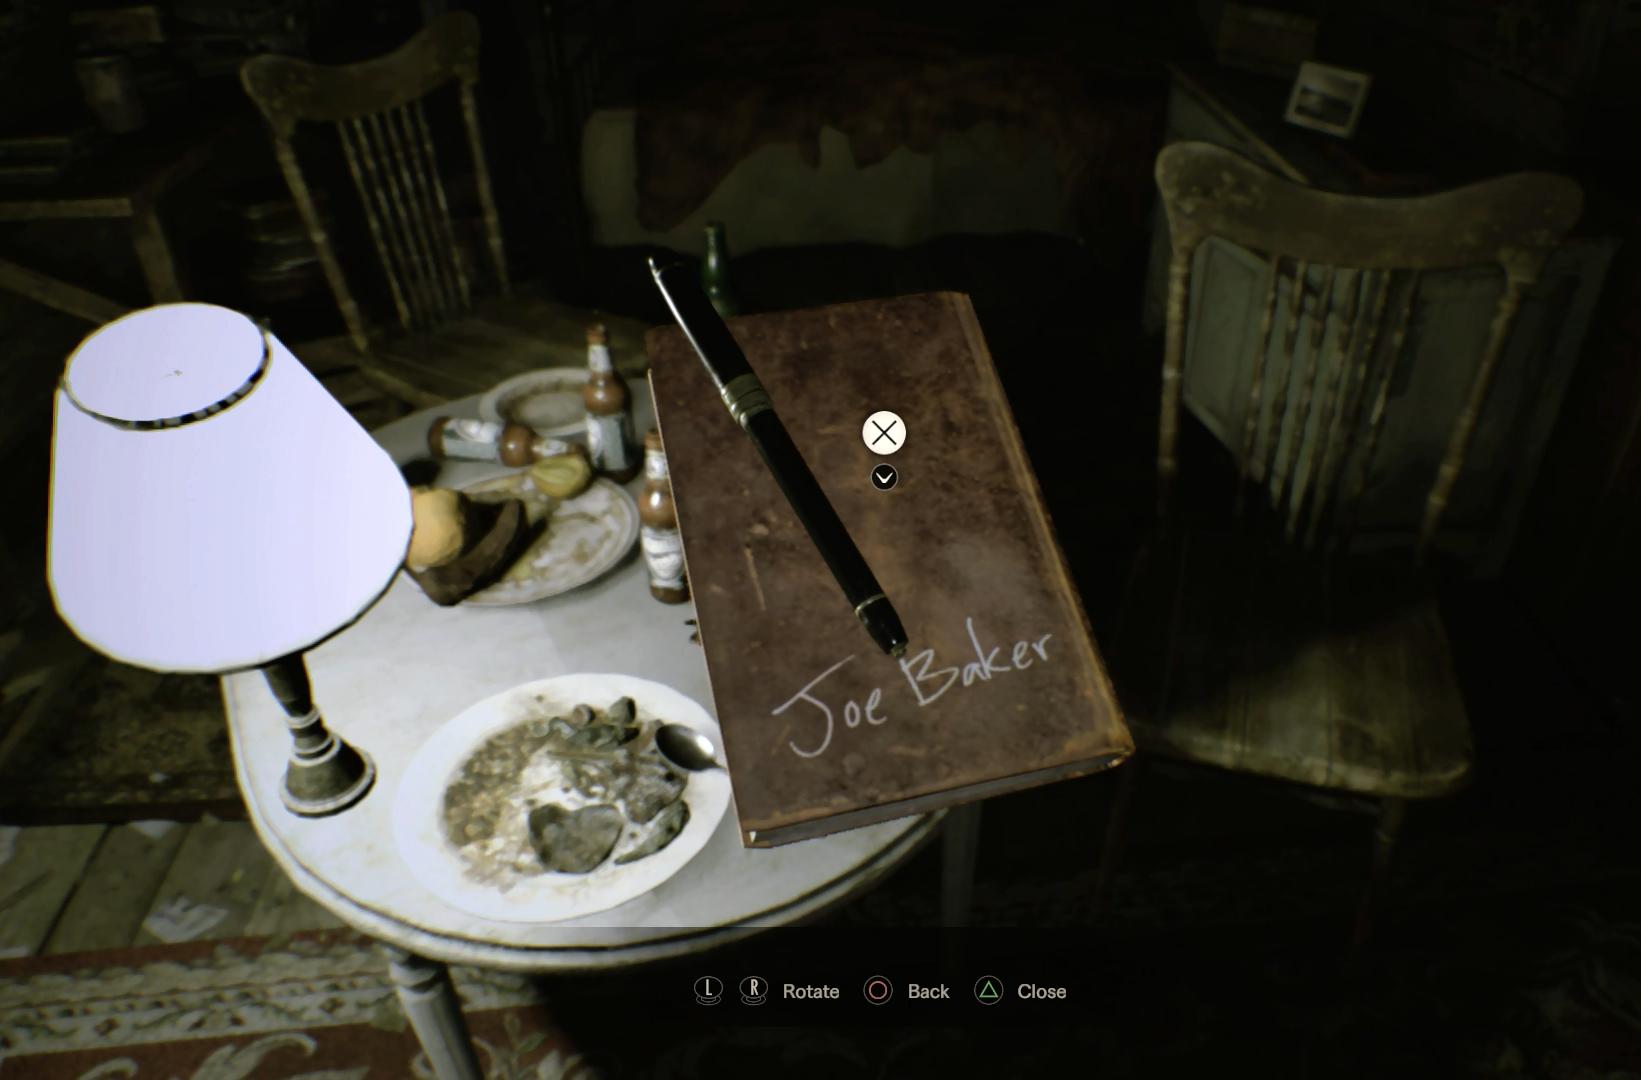 Joe's Survival Manual